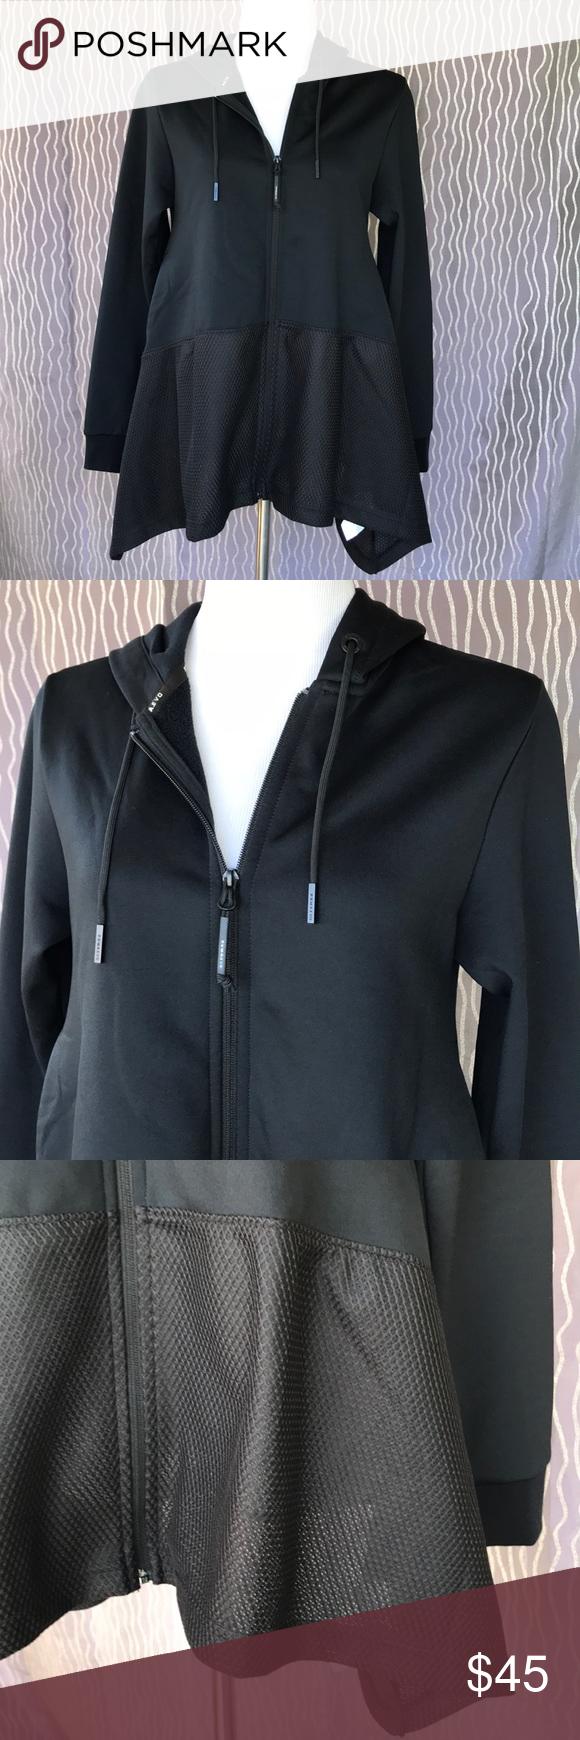 ba183145b02c I just added this listing on Poshmark  Puma.EVO Jacket Hoodie.   shopmycloset  poshmark  fashion  shopping  style  forsale  Puma  Sweaters